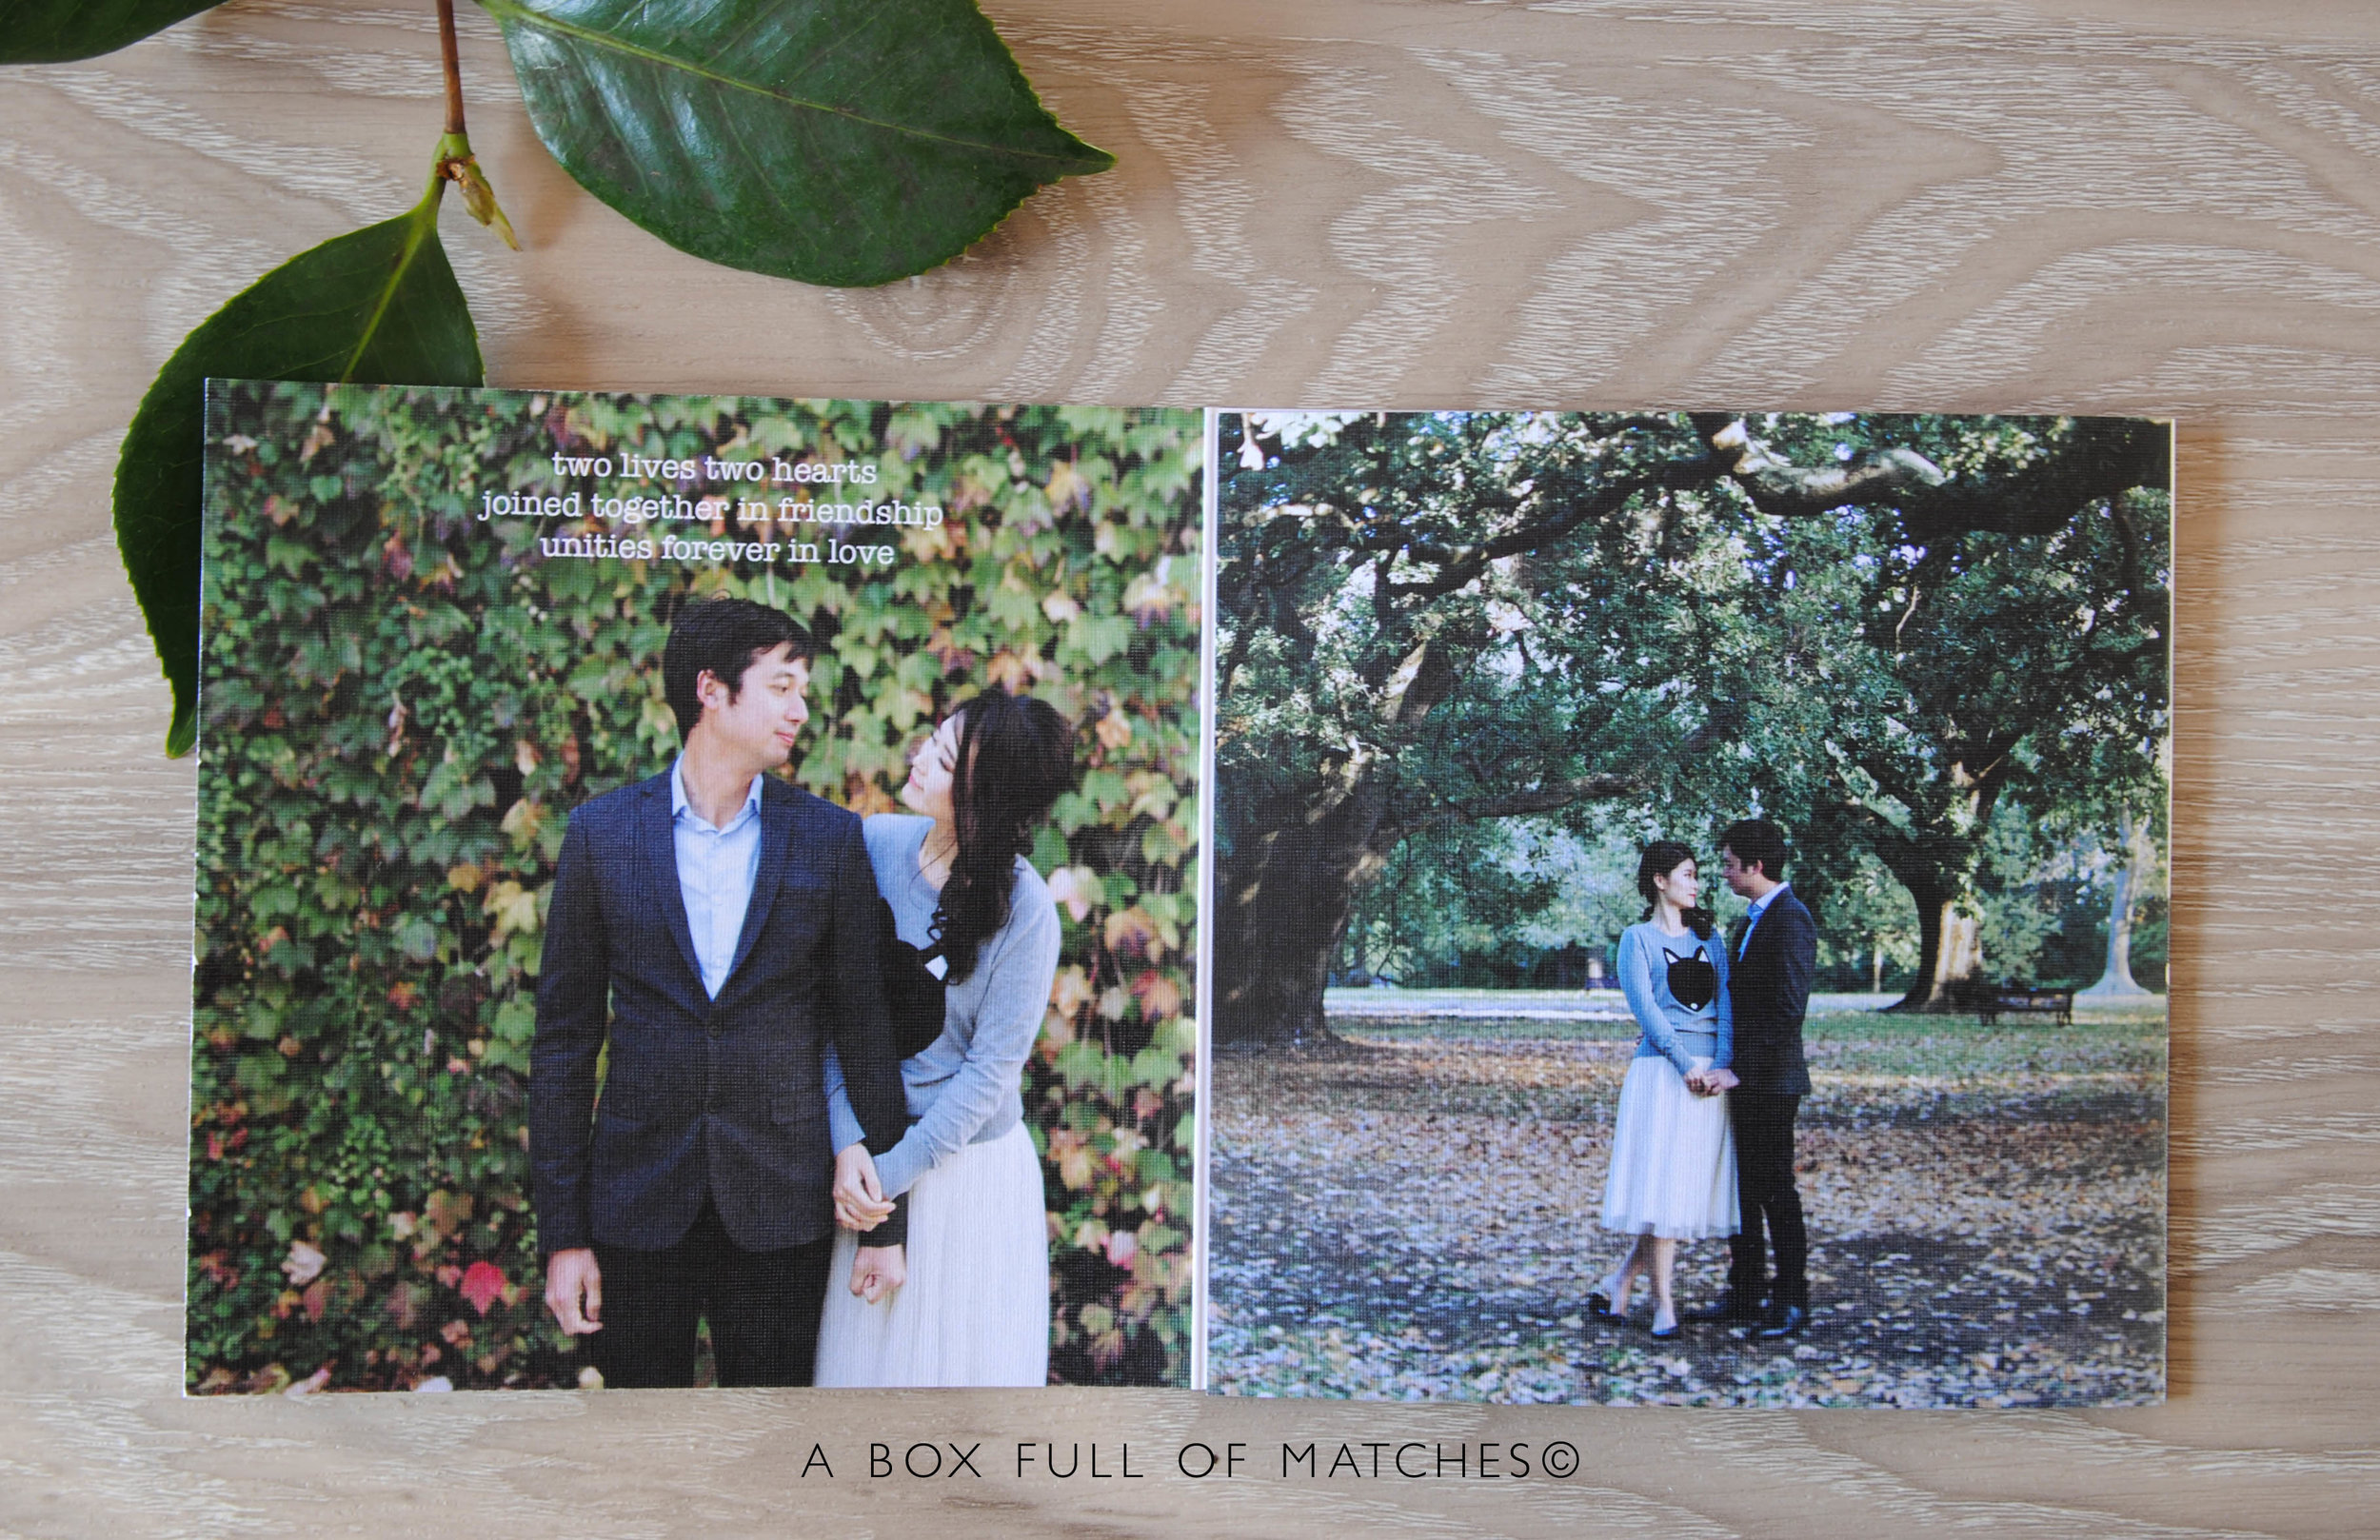 WEDDING-INVITATION-PHOTO-14.jpg